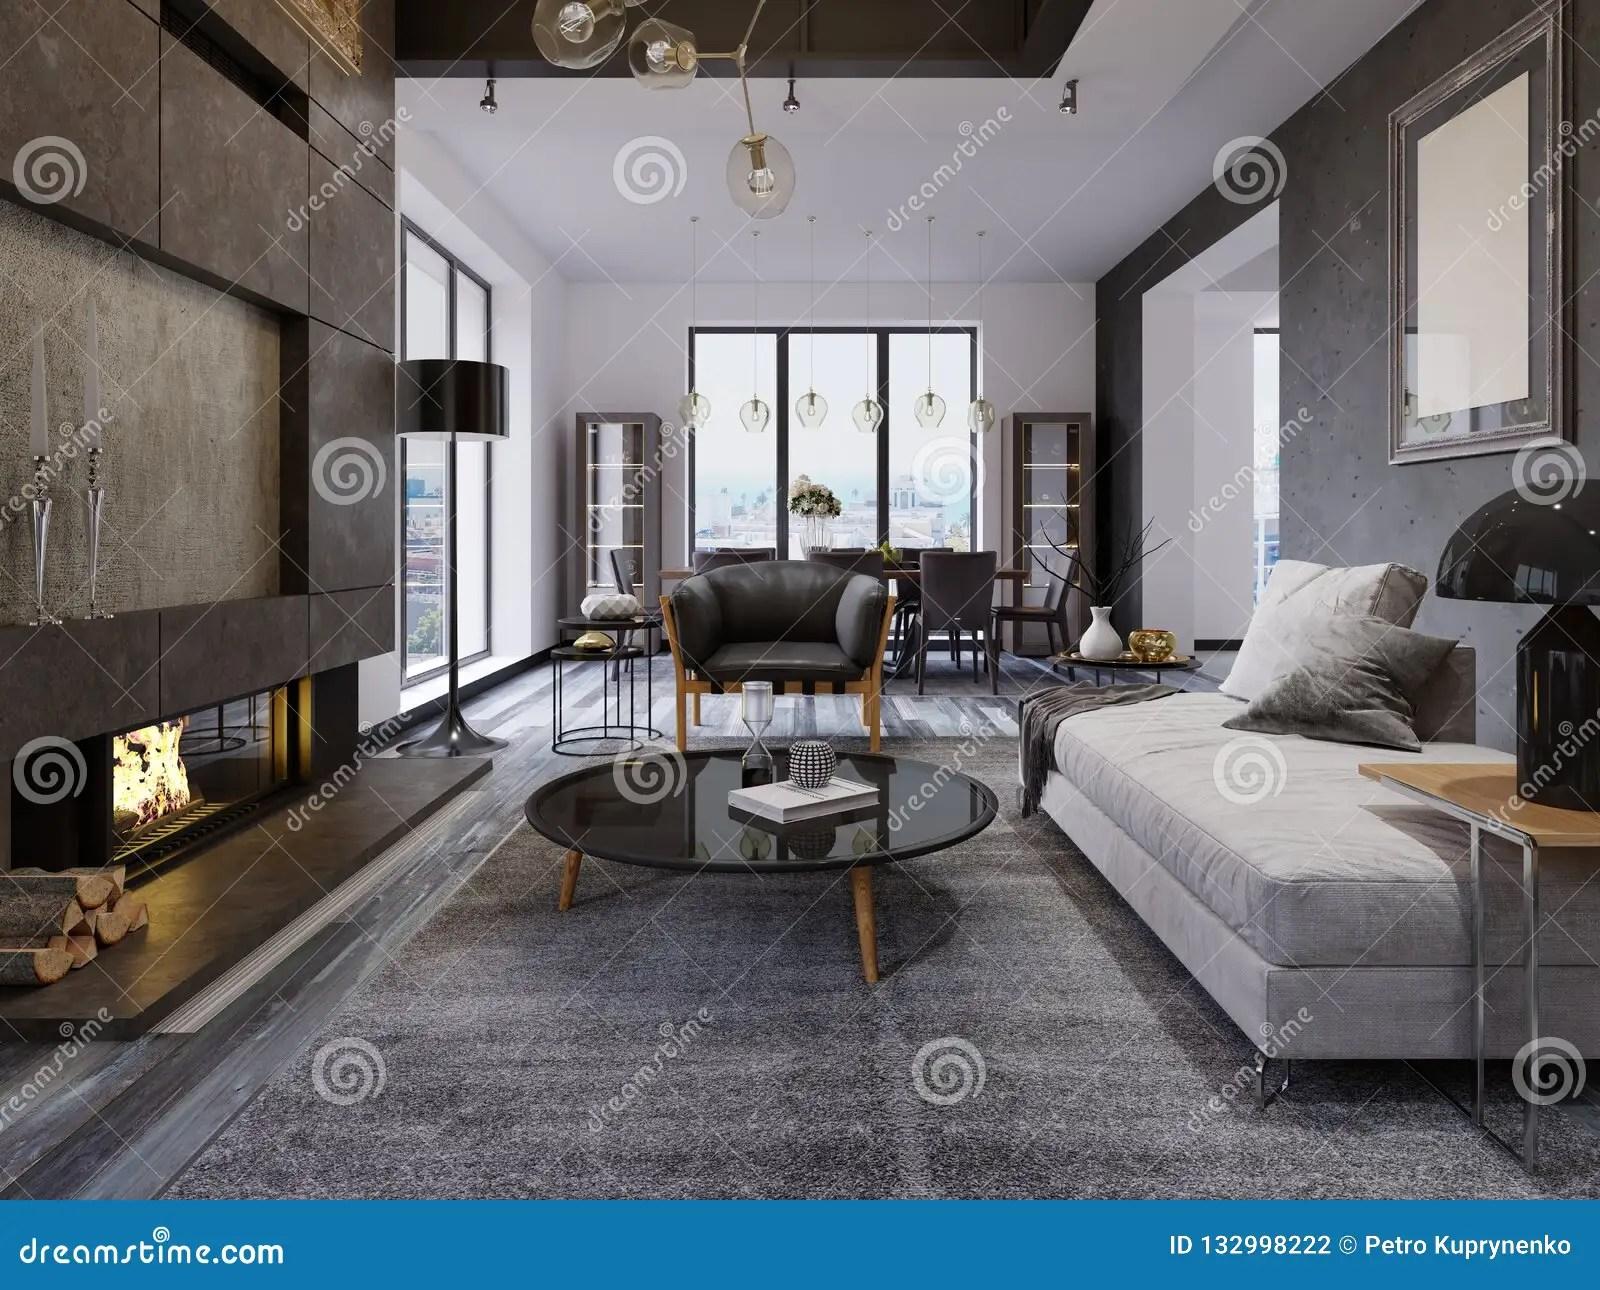 Luxury Duplex Loft Style Apartment Contemporary Furniture